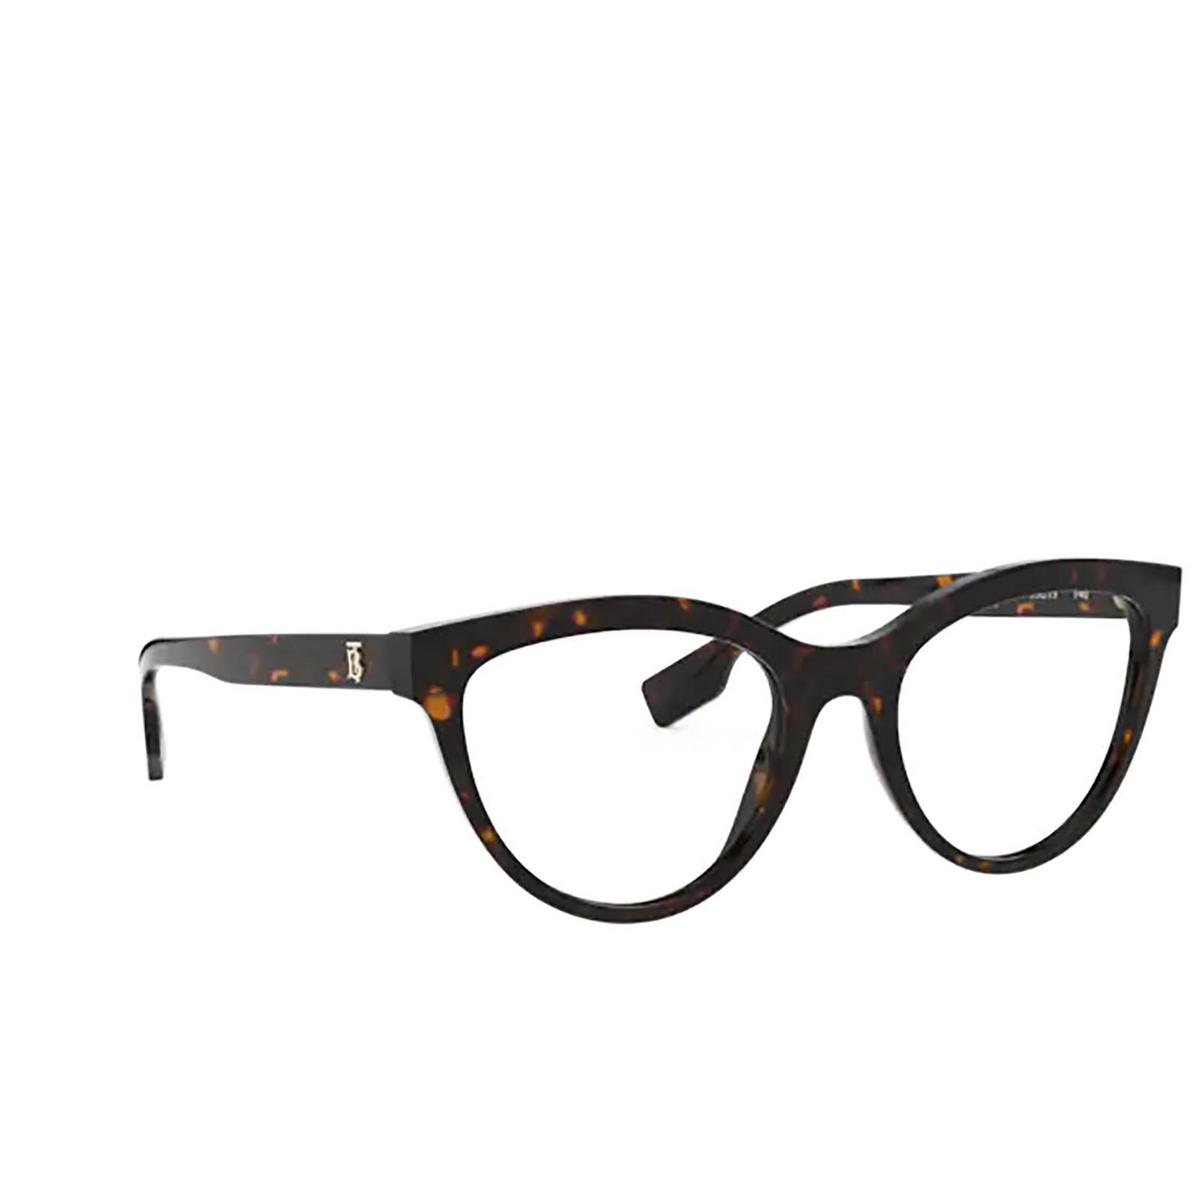 Burberry® Cat-eye Eyeglasses: Lillie BE2311 color Dark Havana 3002 - three-quarters view.